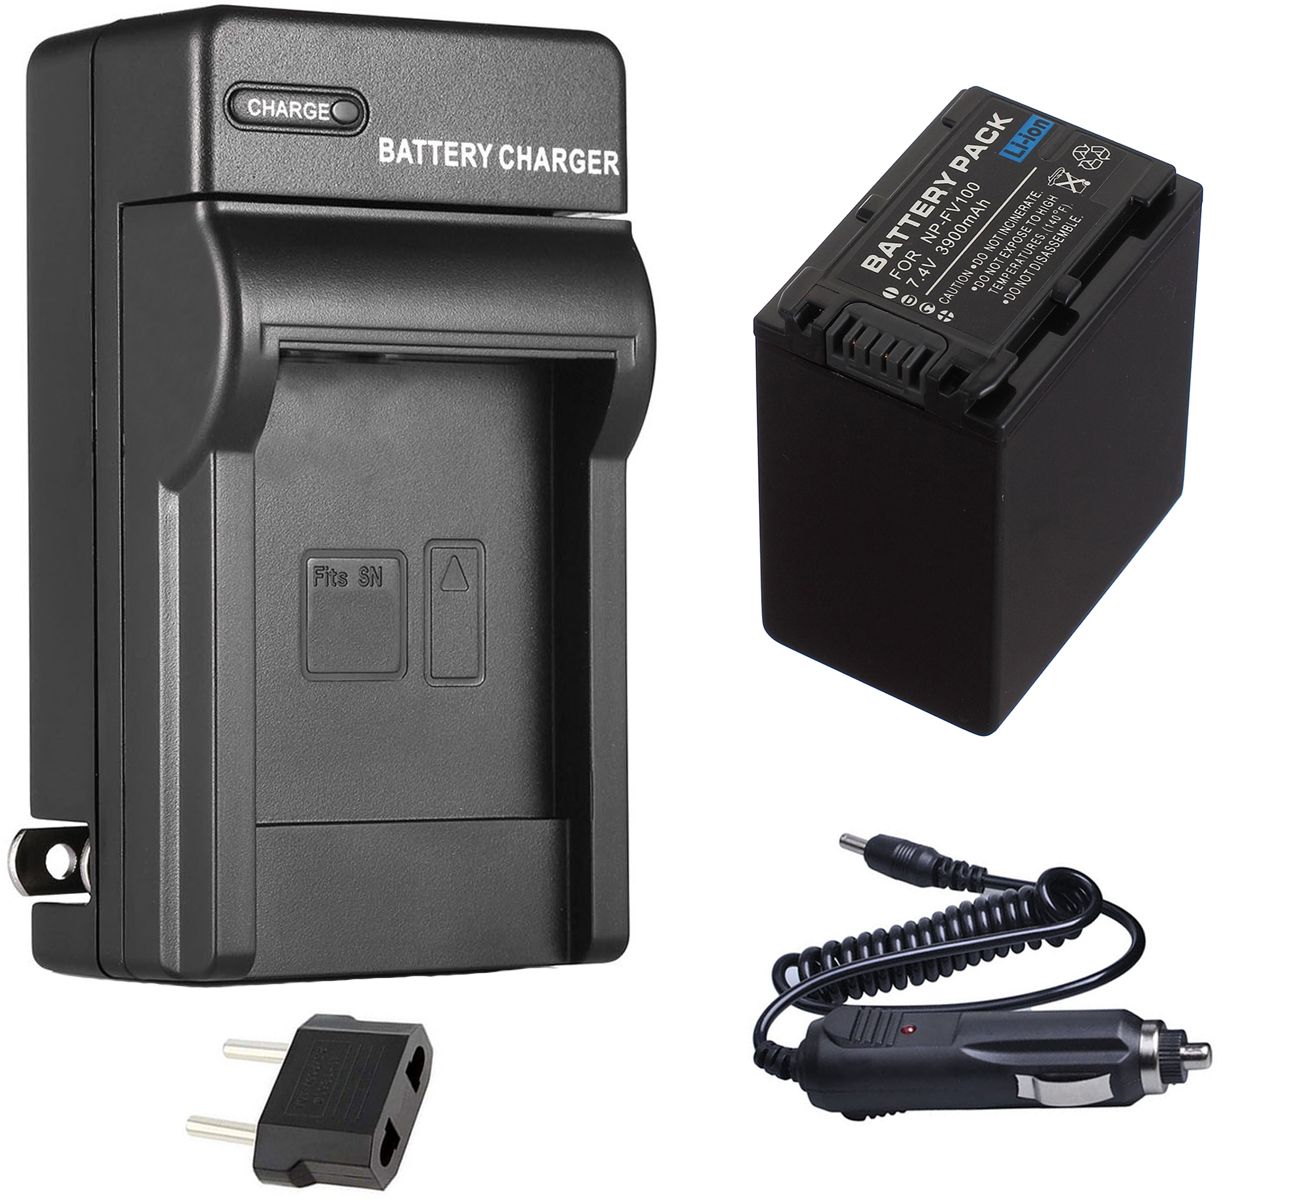 HDR-PJ350E HDR-PJ390E Handycam Camcorder HDR-PJ340E HDR-PJ380E HDR-PJ330E USB Power Adapter Charger for Sony HDR-PJ320E